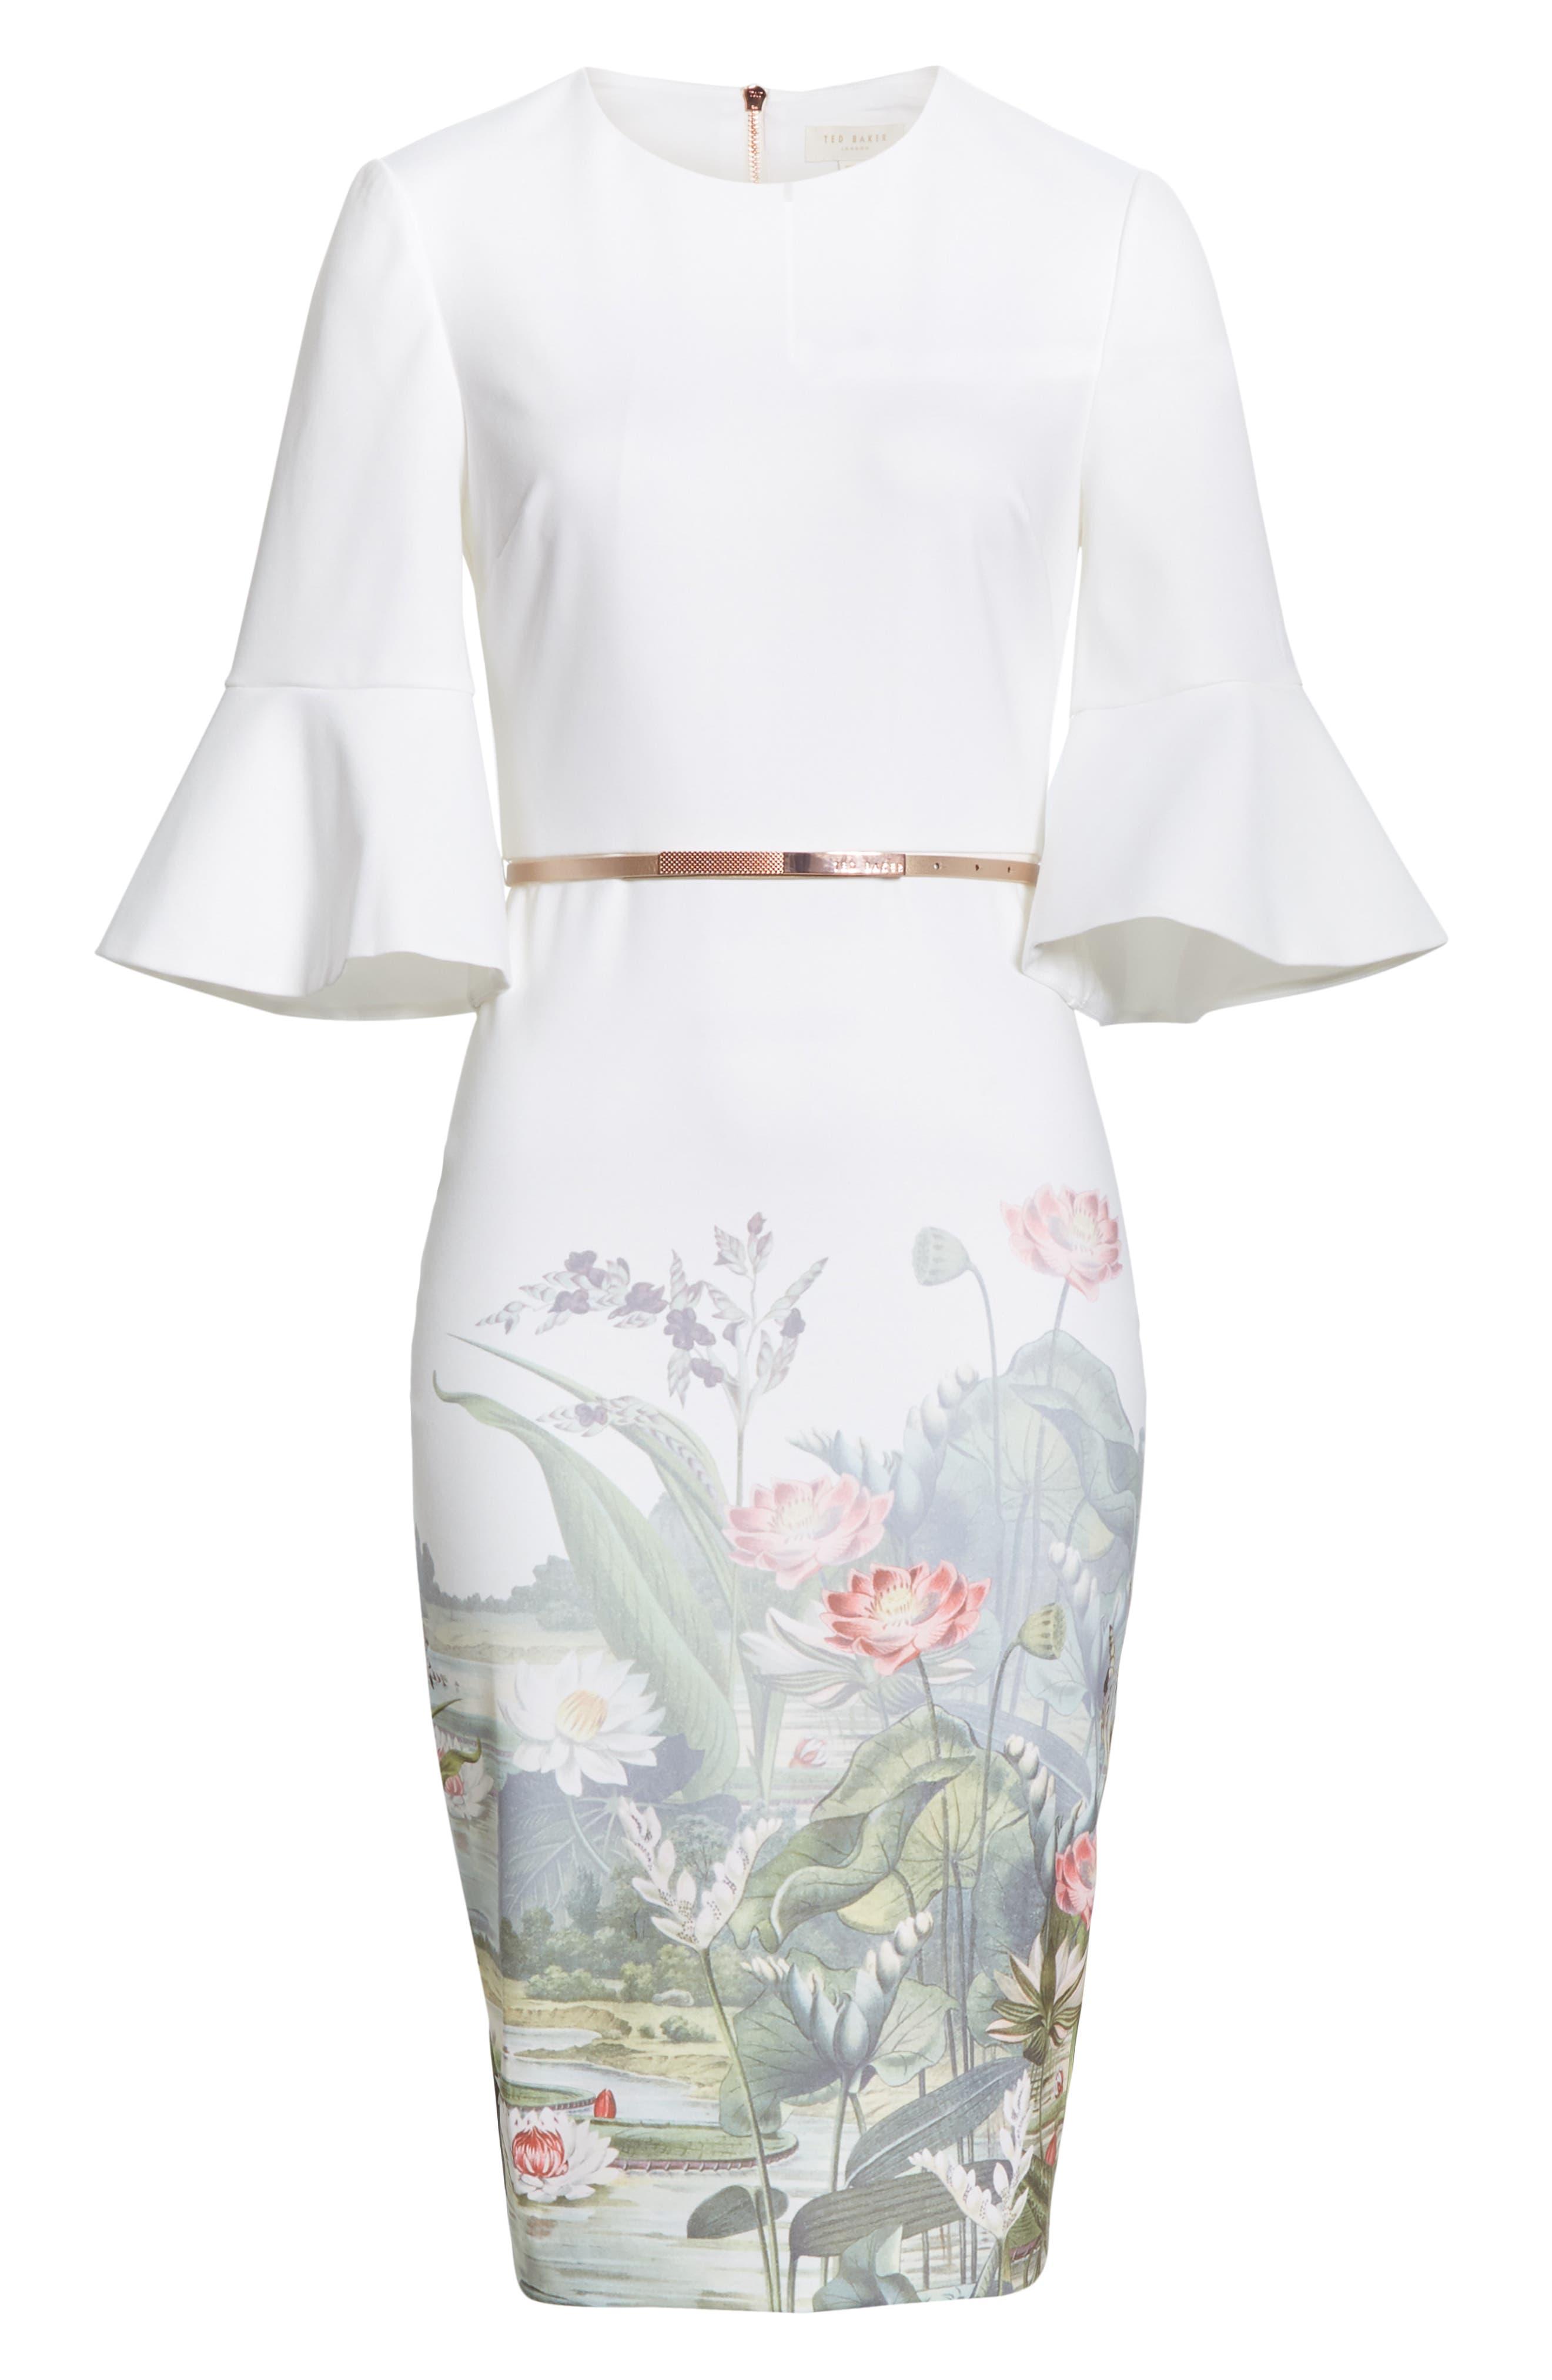 TED BAKER LONDON, Azania Wonderland Body-Con Dress, Alternate thumbnail 7, color, 900